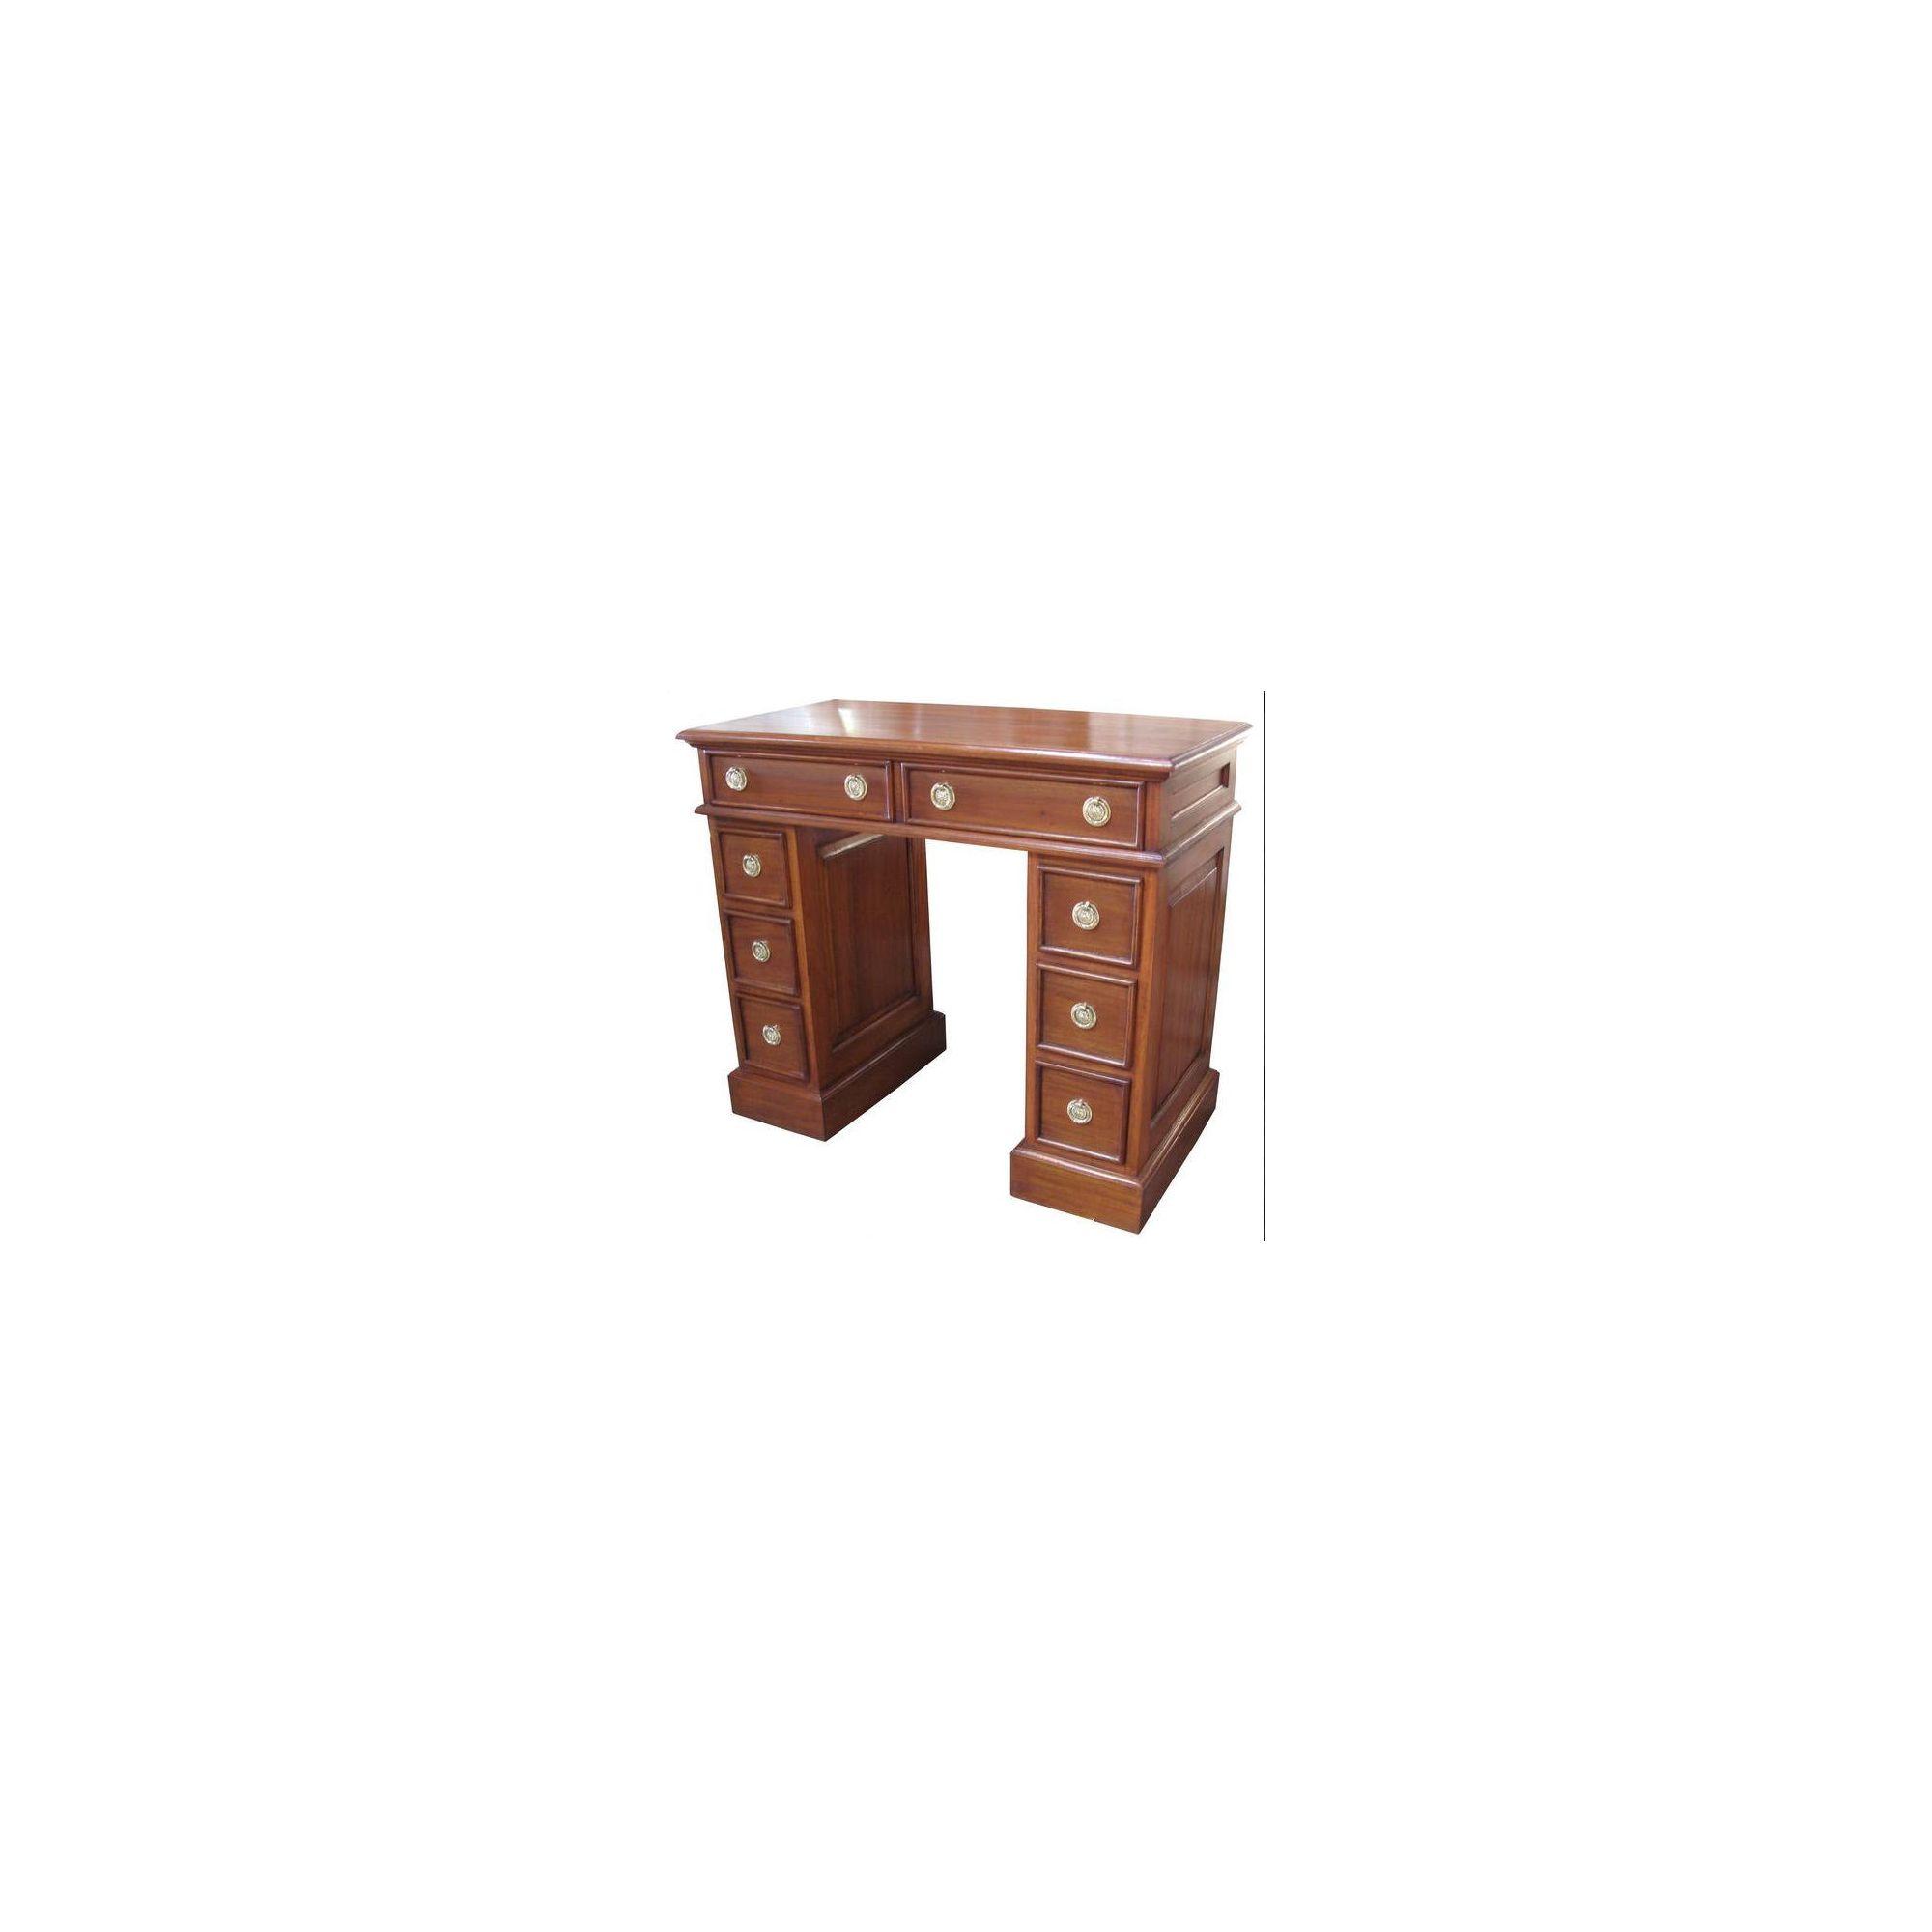 Lock stock and barrel Mahogany Petite Desk in Mahogany at Tesco Direct